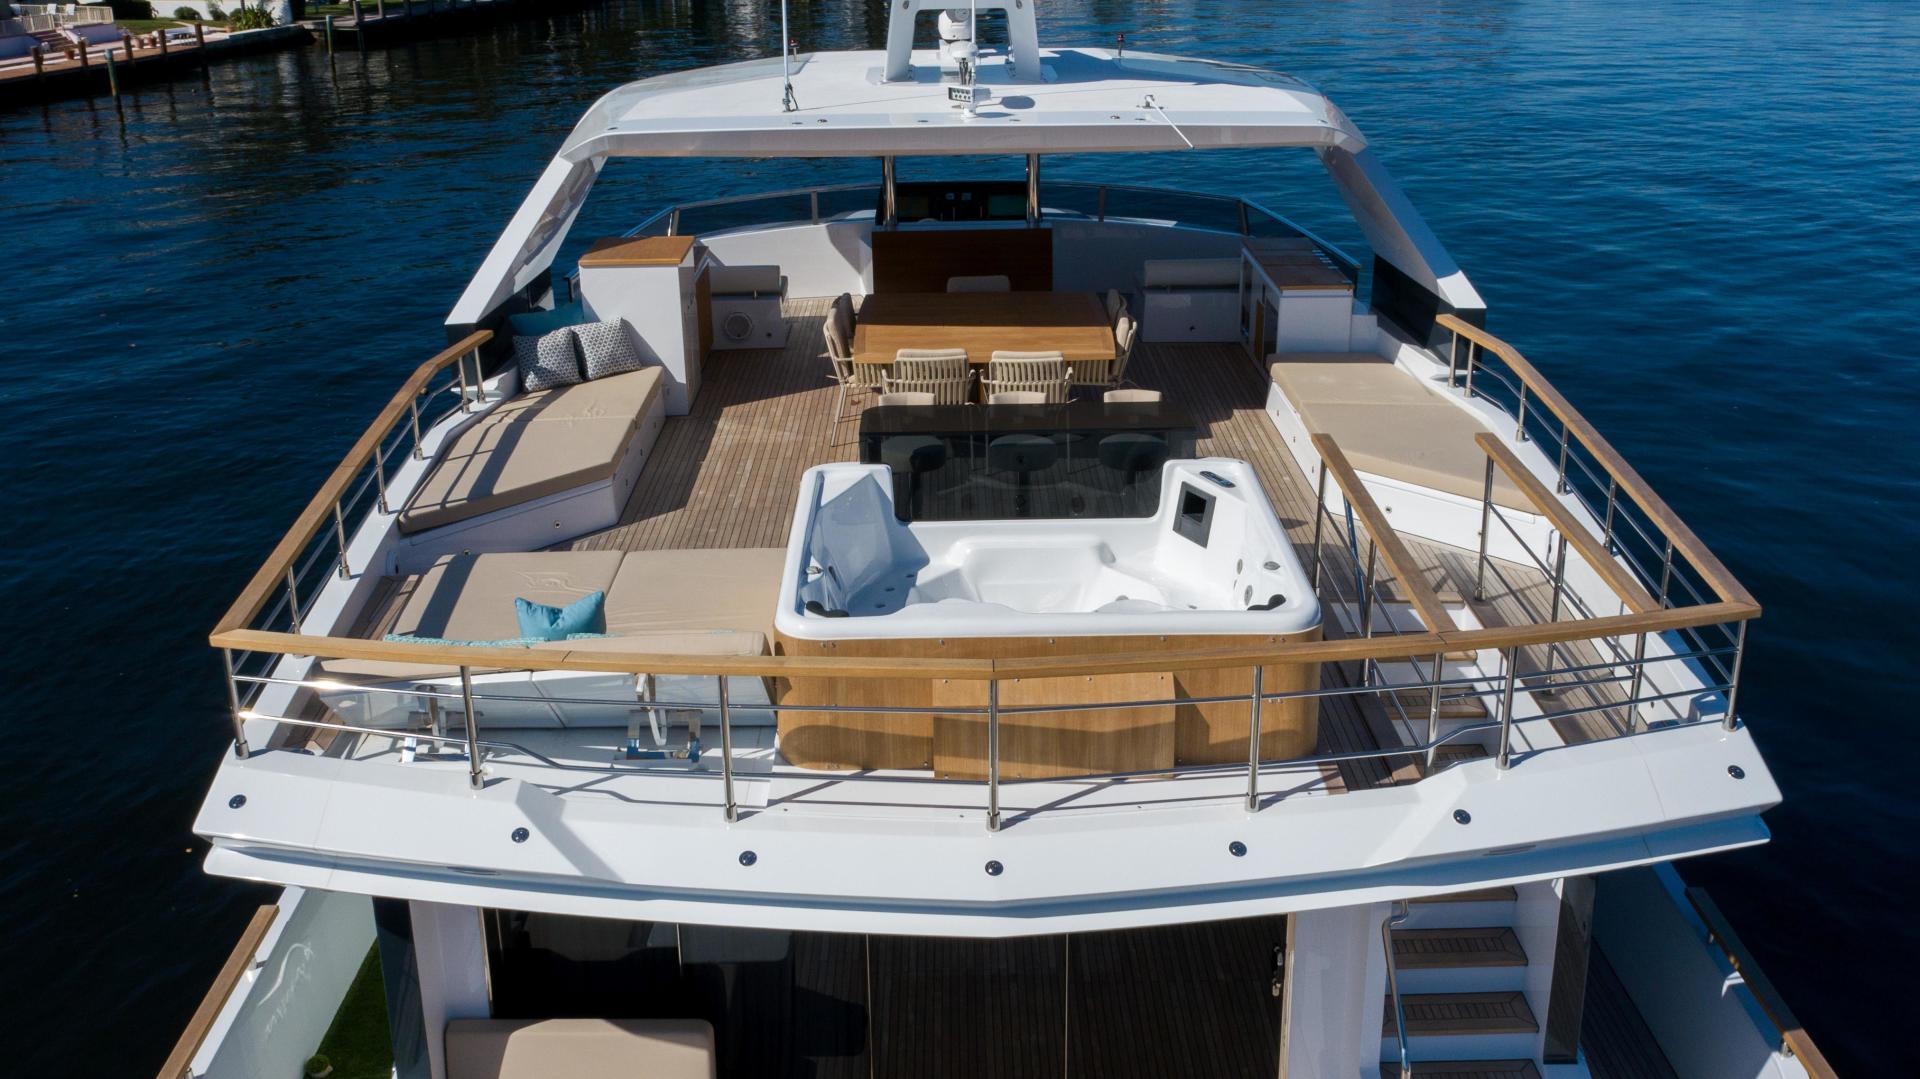 Numarine-32XP 2020-7 Diamonds Fort Lauderdale-Florida-United States-1629339 | Thumbnail